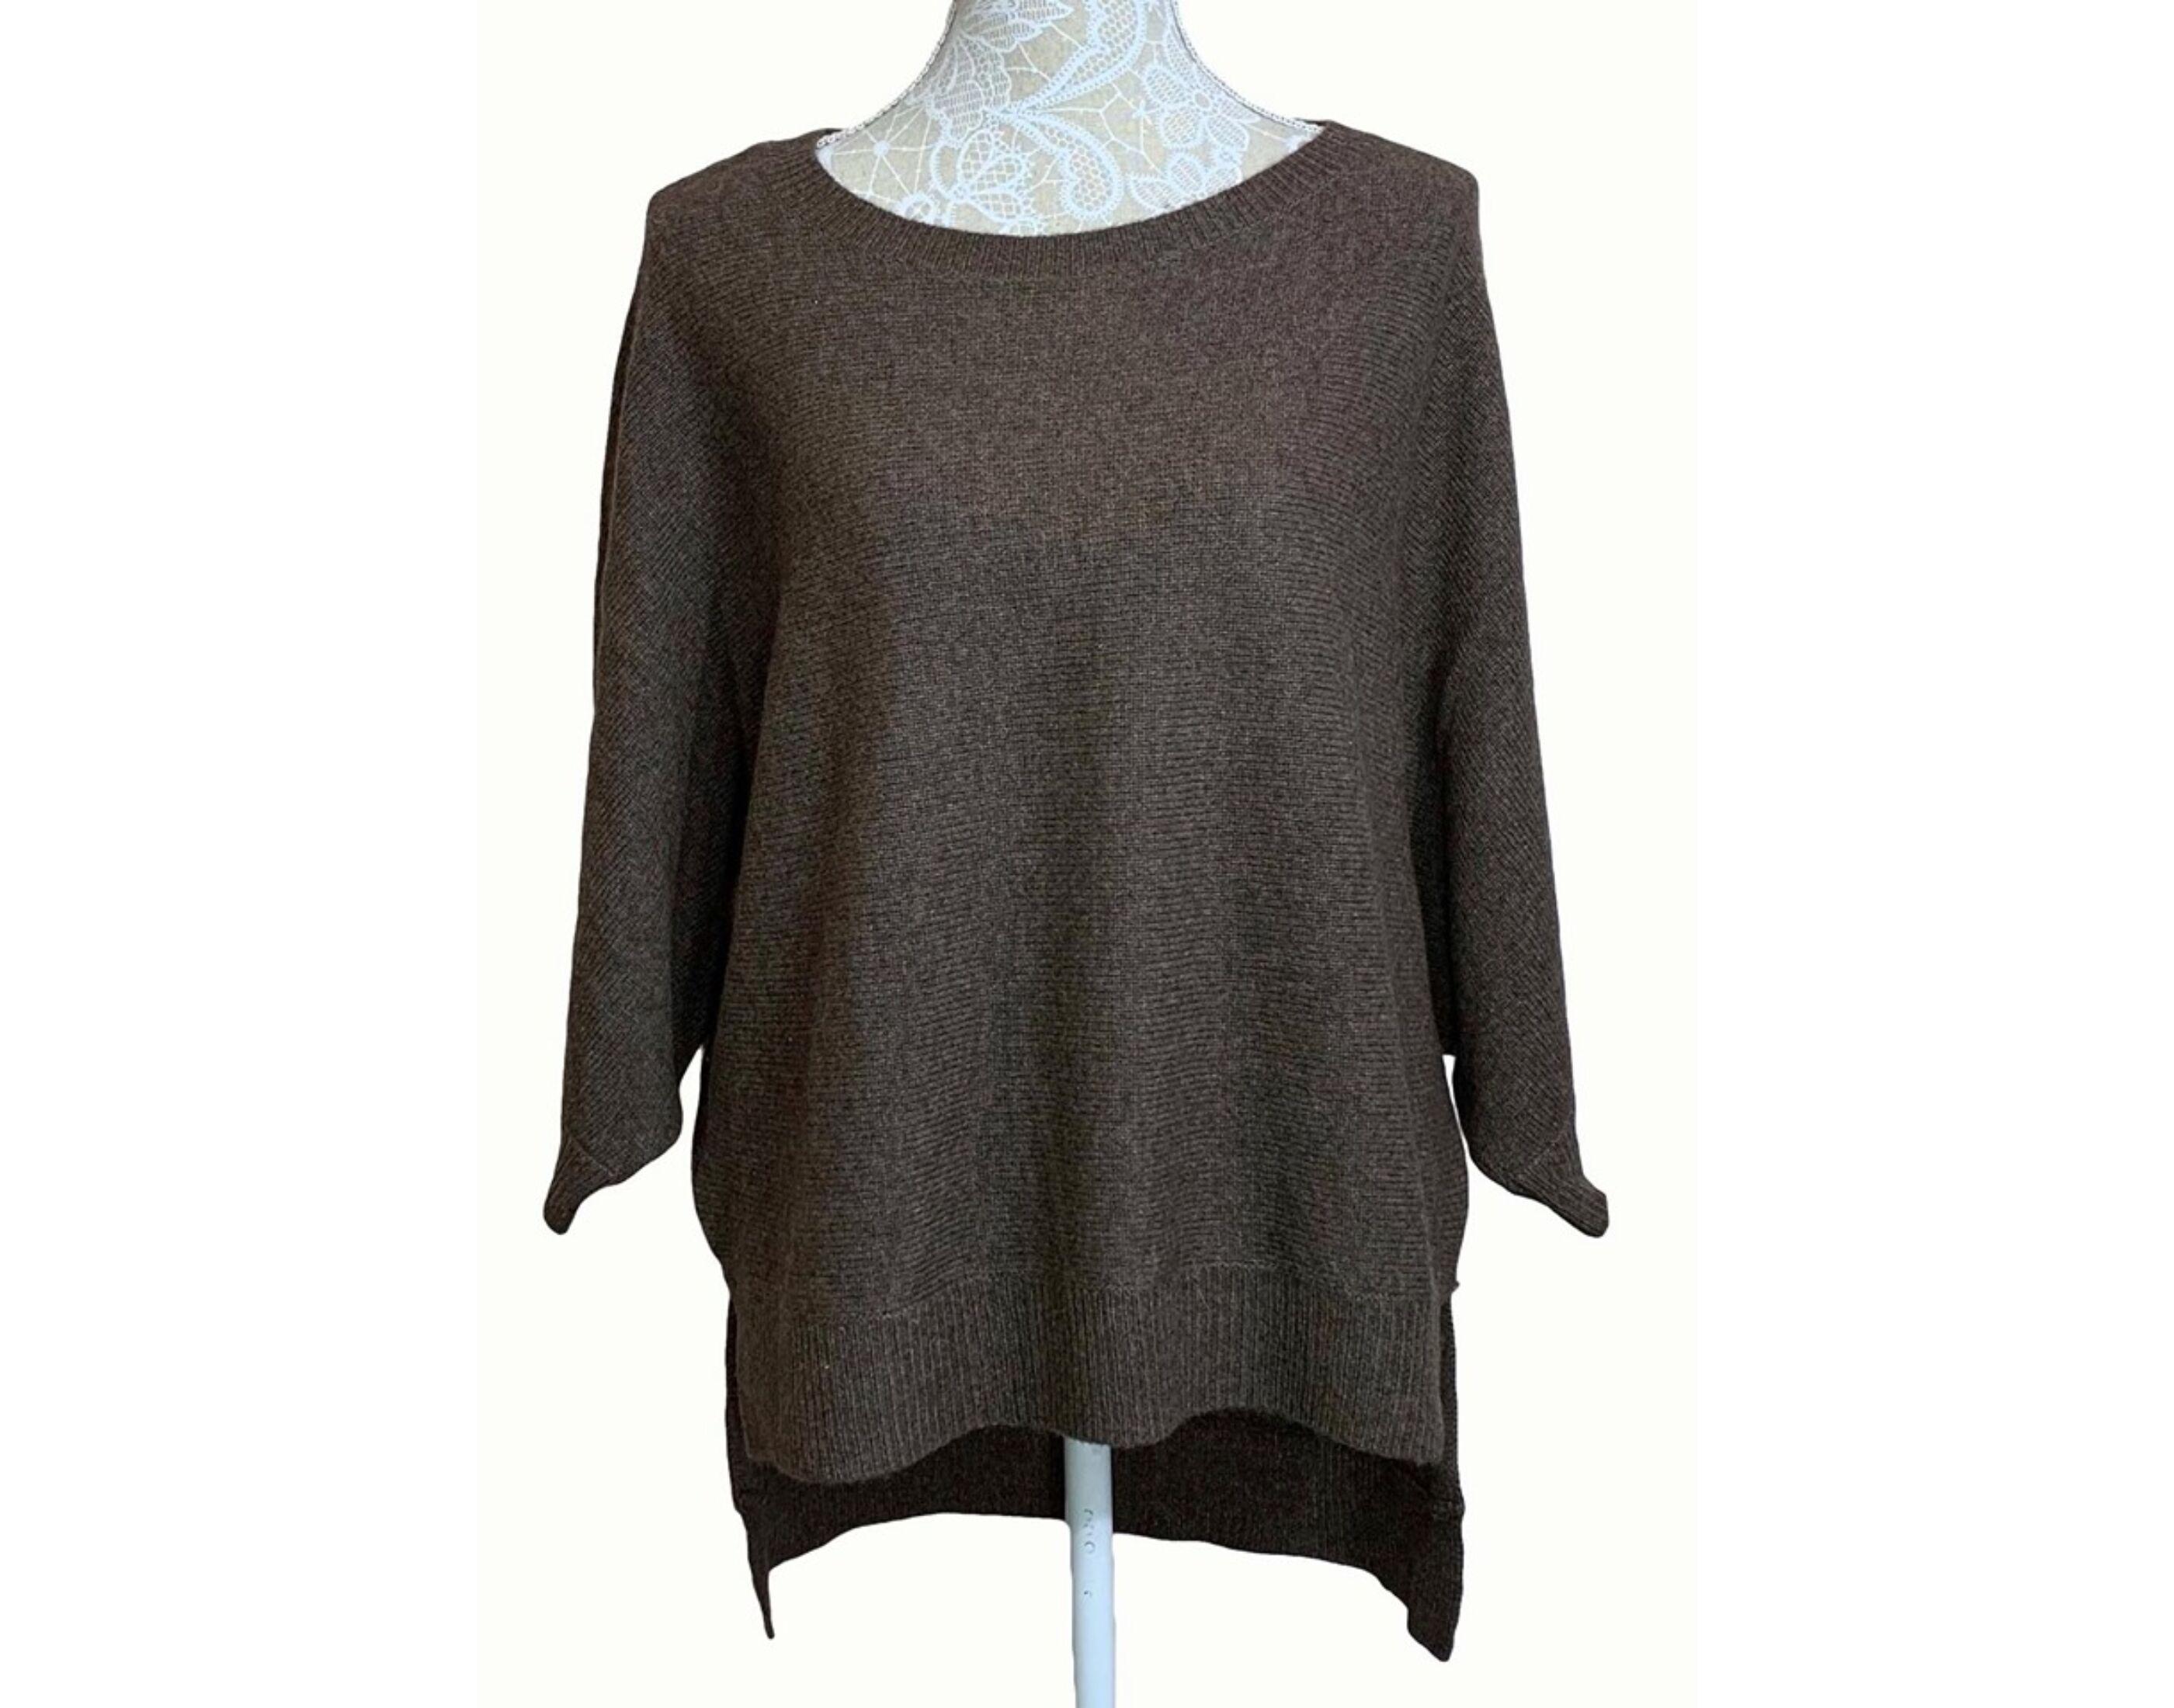 BCBG MAXAZRIA kötött pulóver (M)